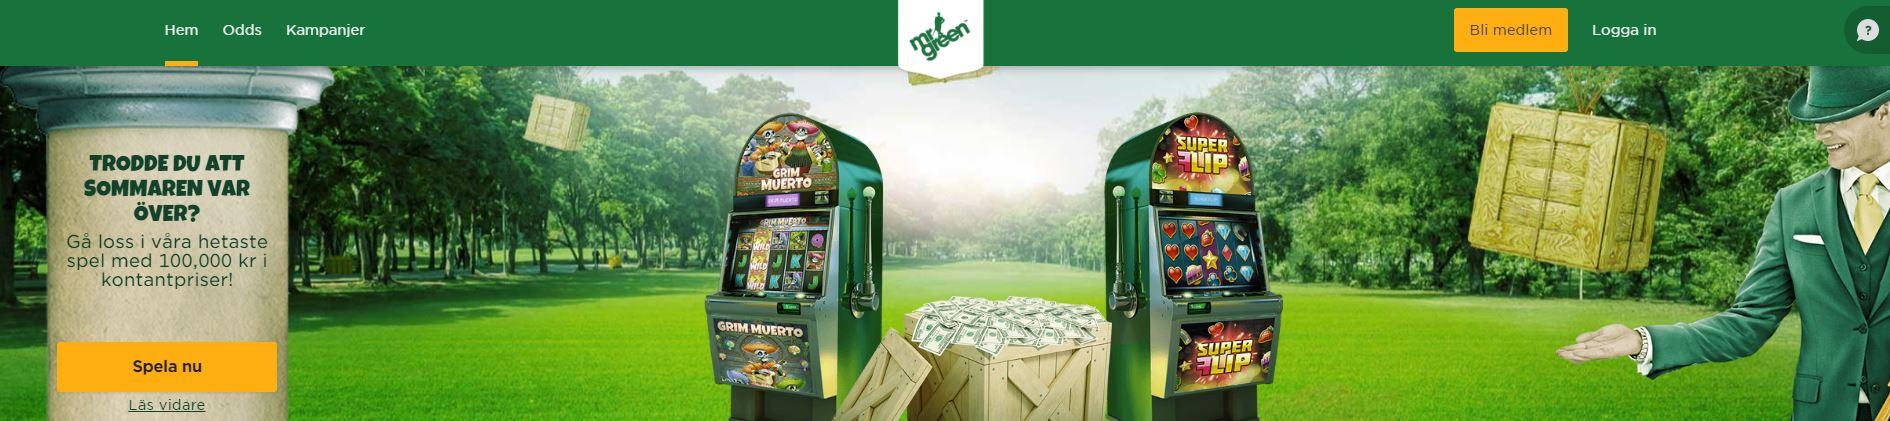 mrgreen casino no deposit bonus